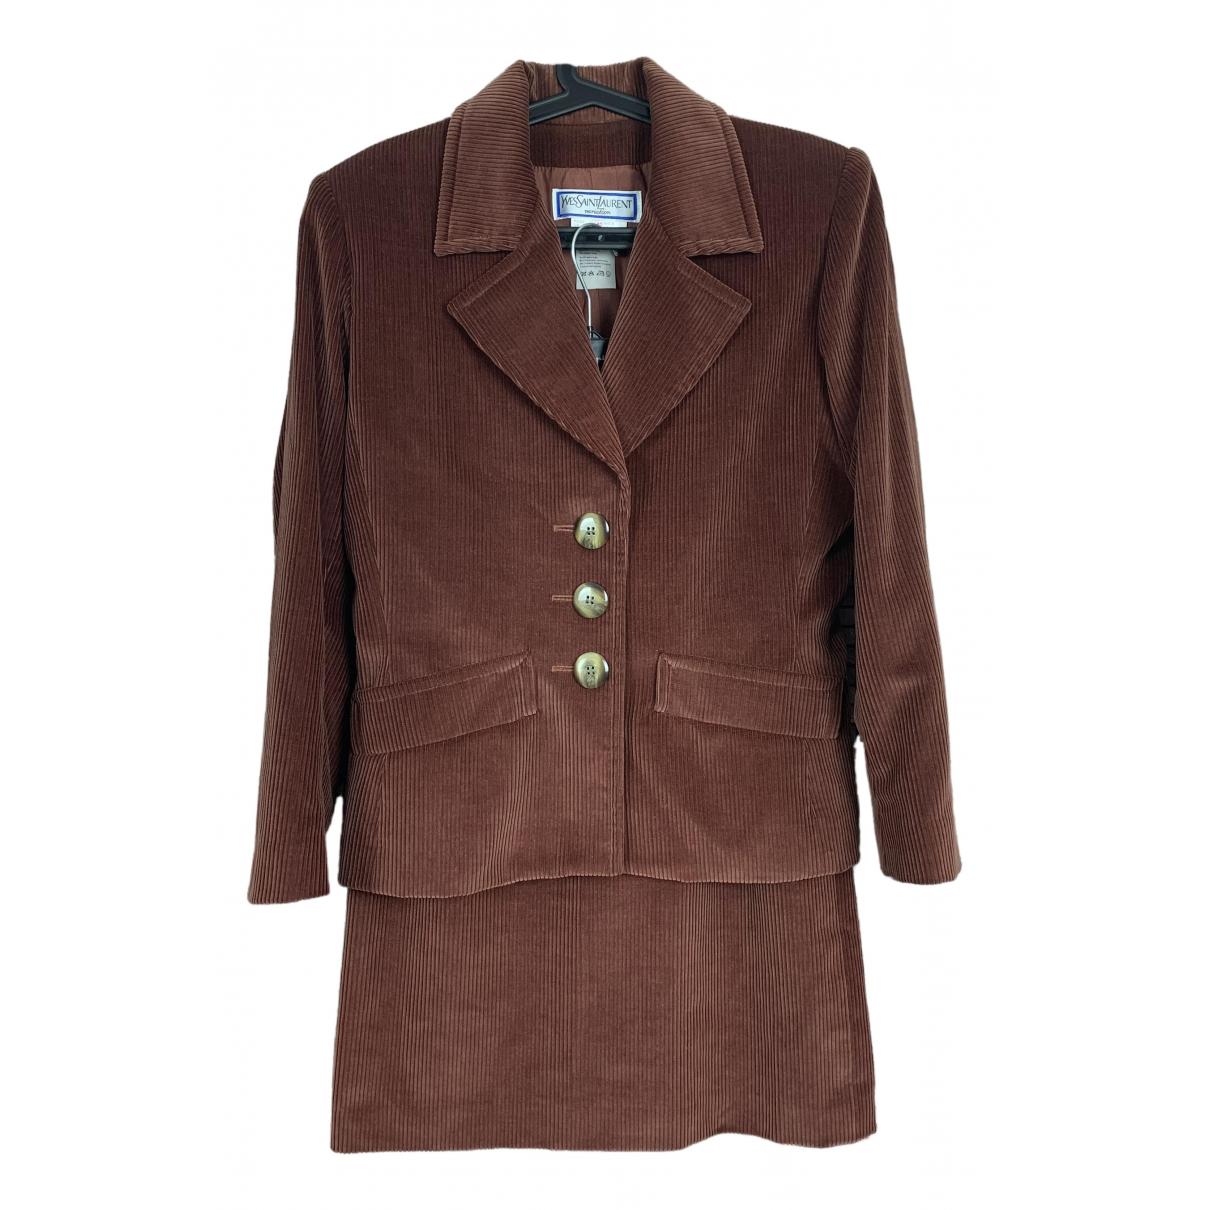 Yves Saint Laurent N Brown Cotton jacket for Women 42 IT